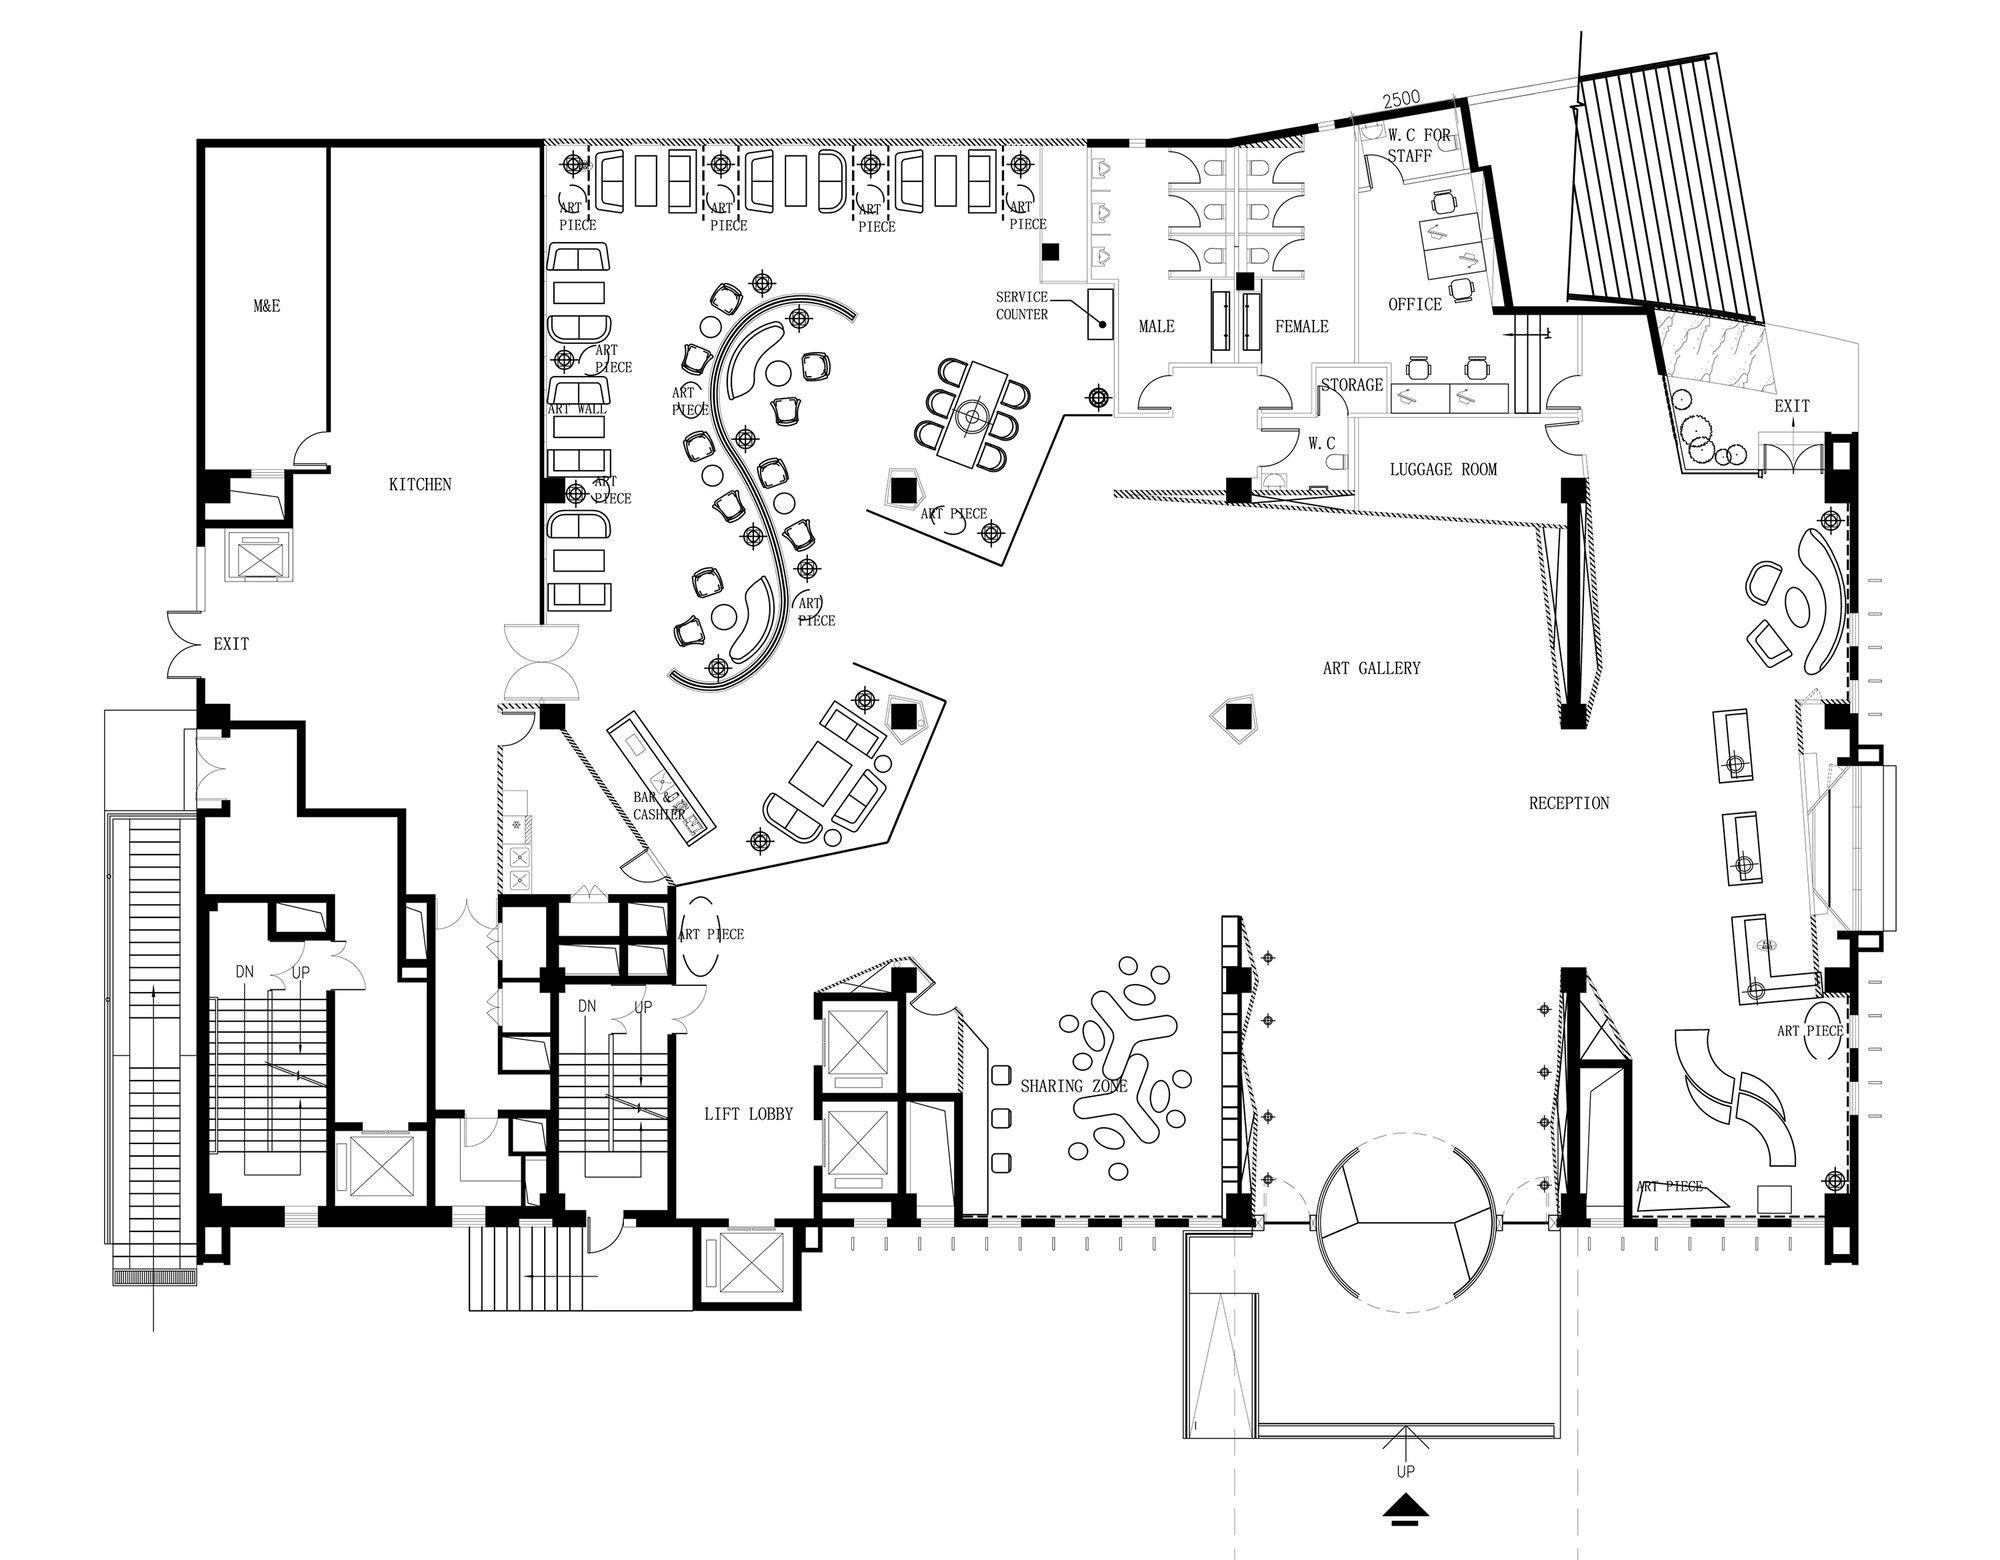 Hotel lobby floor plan - Gallery Of Skytel Panorama 24 Hotel Receptionhotel Motelhotel Lobbyboutique Hotelshotels Infloor Planshotel